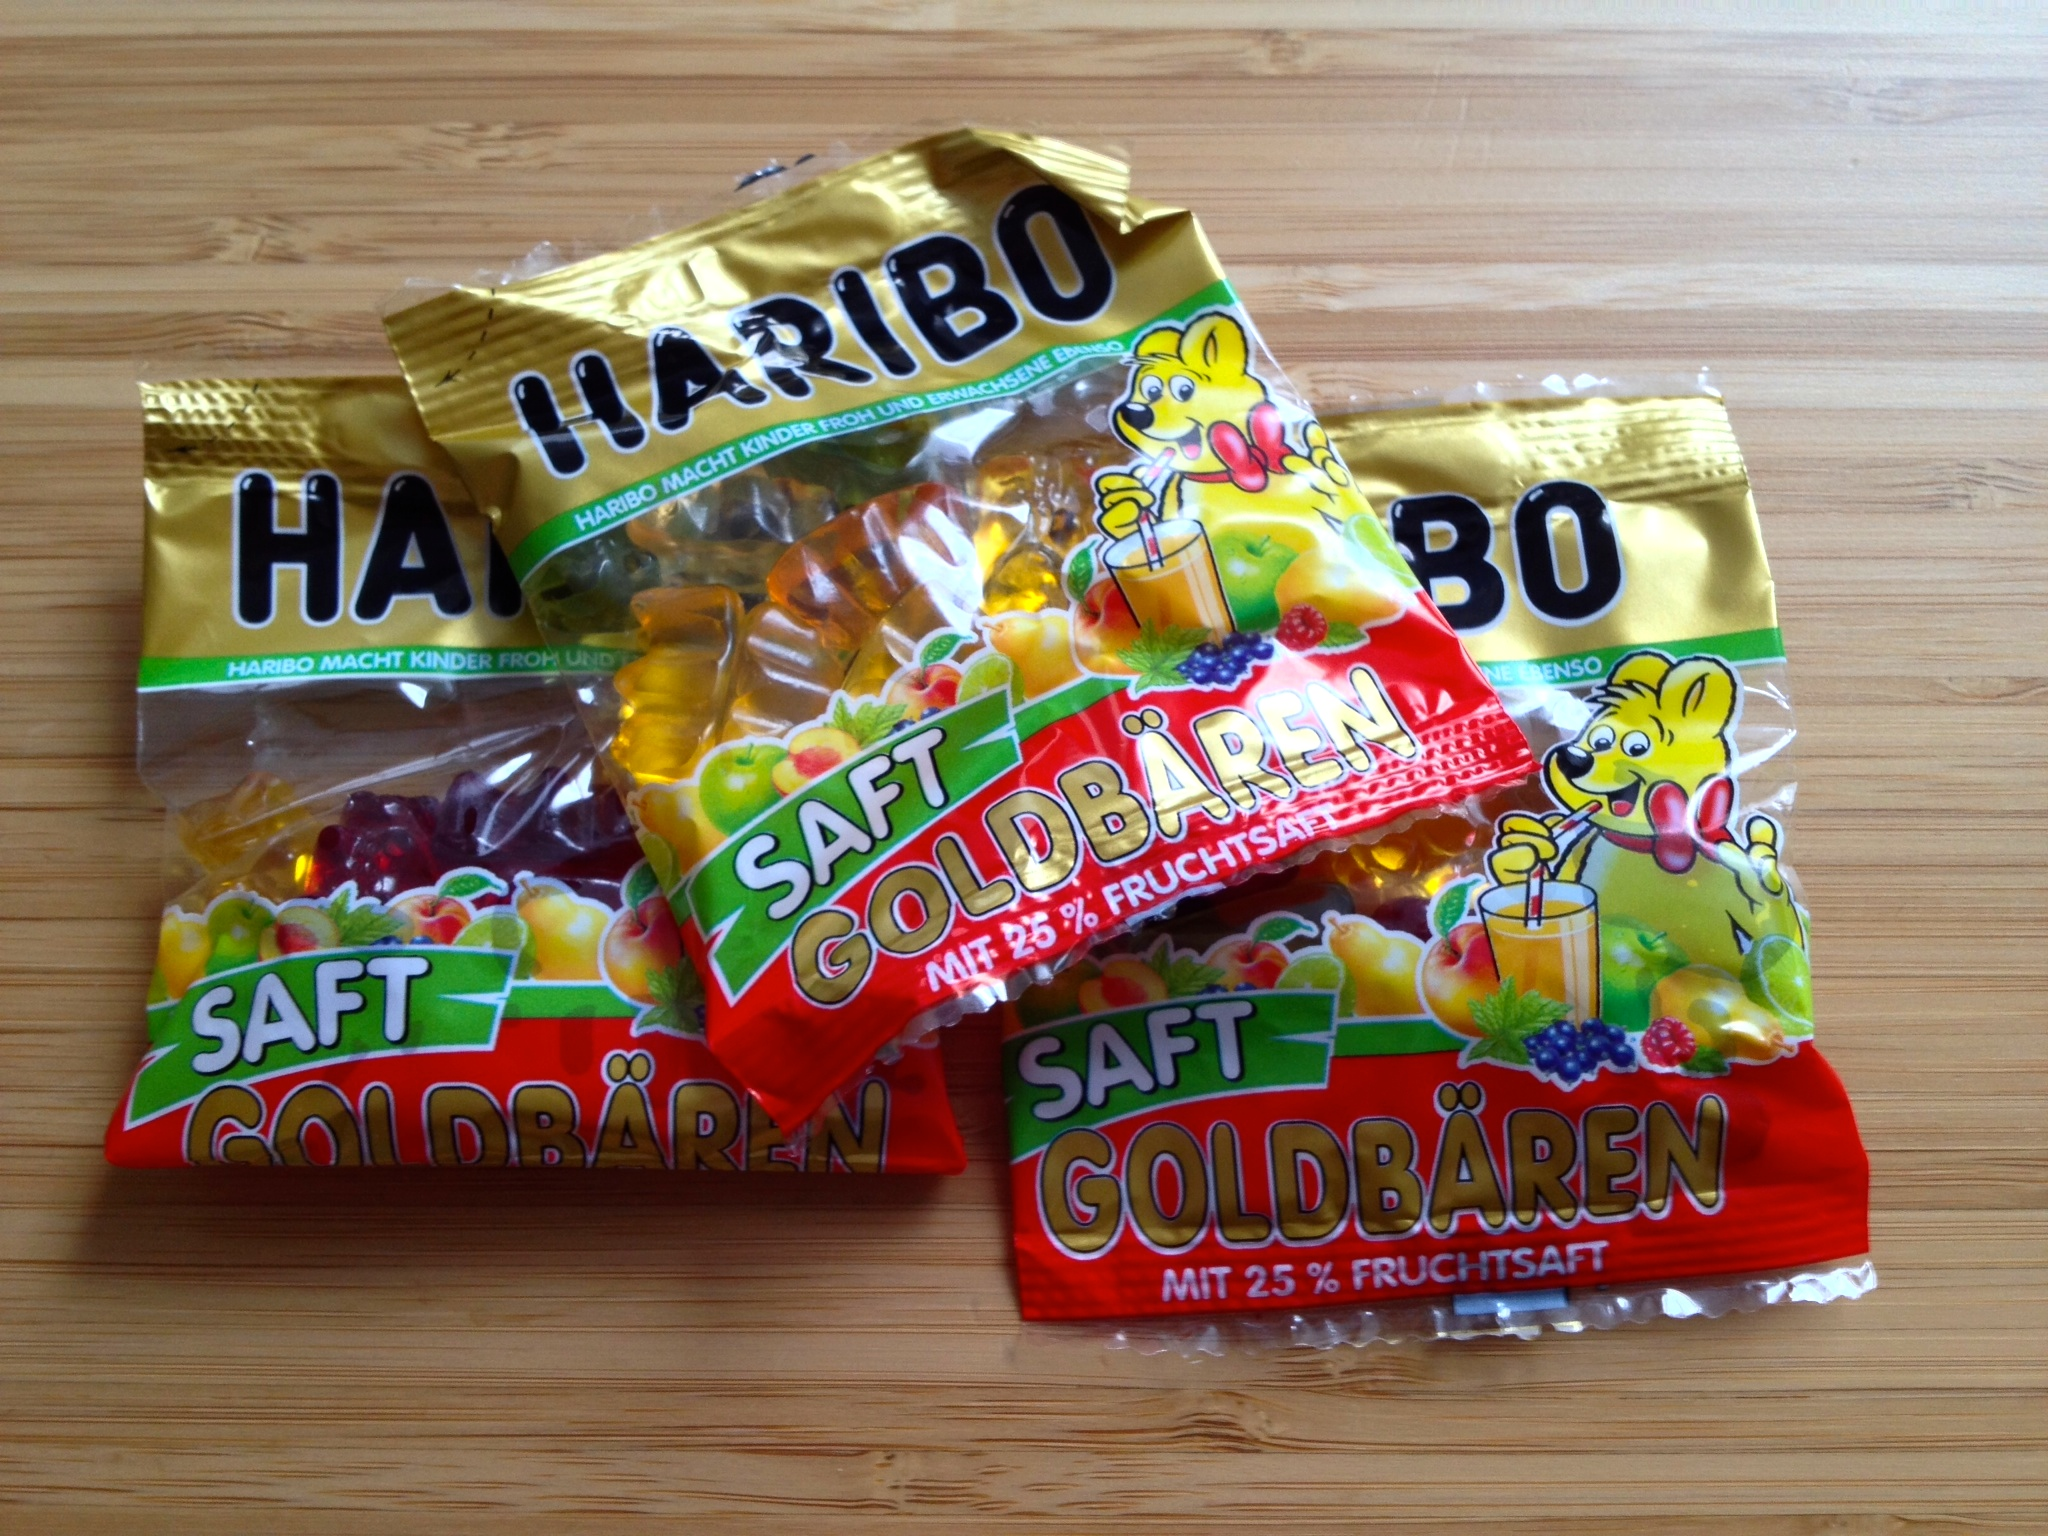 Haribo Gummy Bears (fruit-flavored)